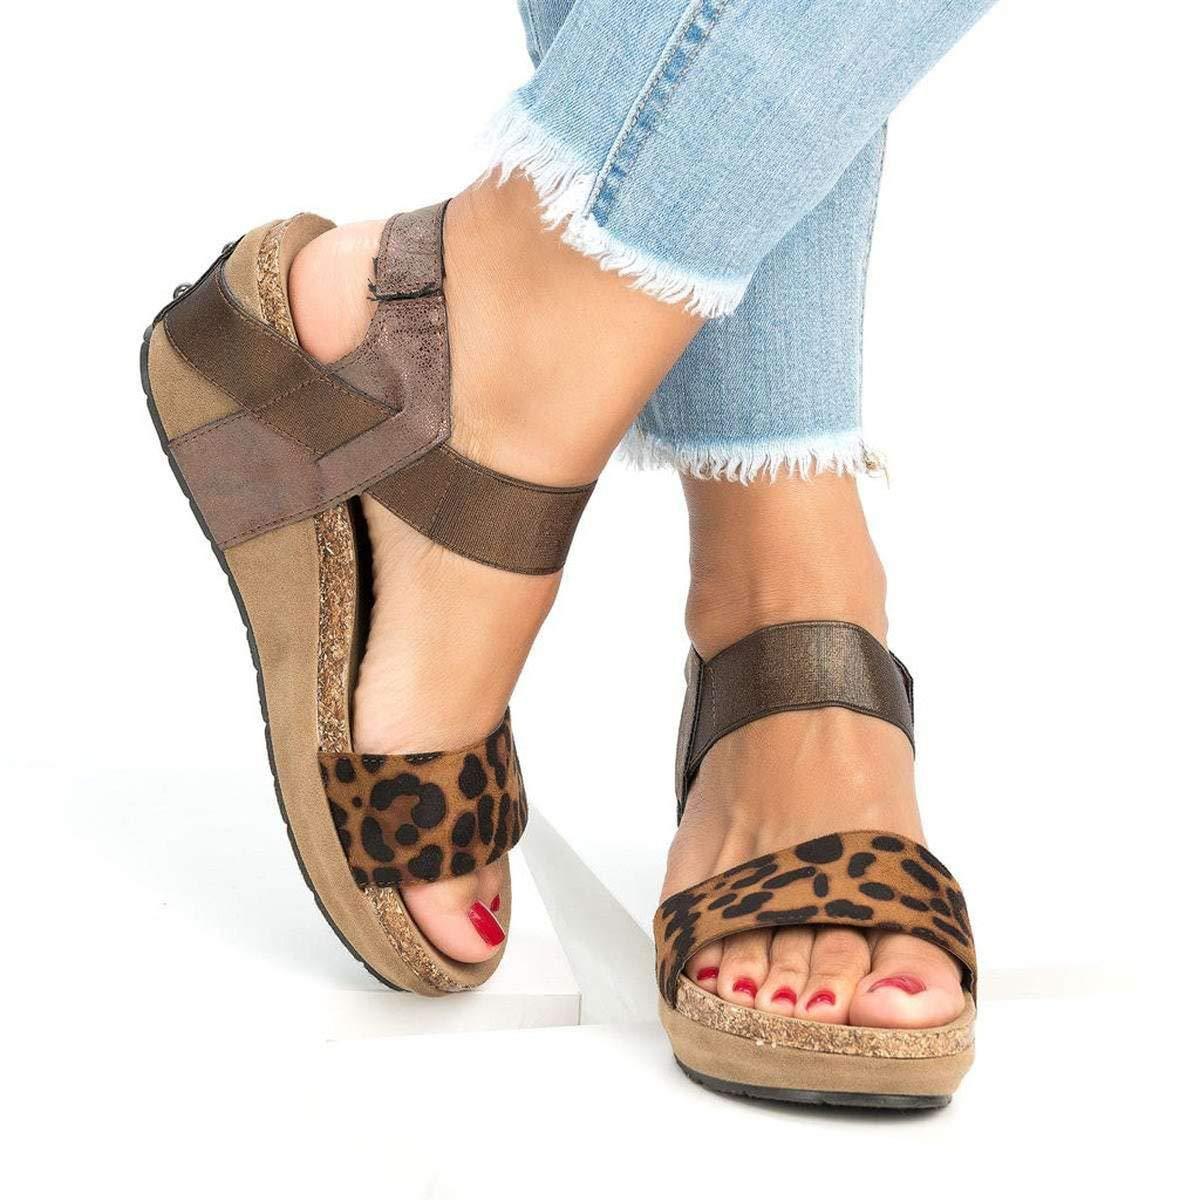 Meiliwanju Women's Ankle Strap Open Toe Summer Vegan PU Leather Platform Sandal Casual Low Heeled Strappy Wedge Sandals (Khaki, 8.5)